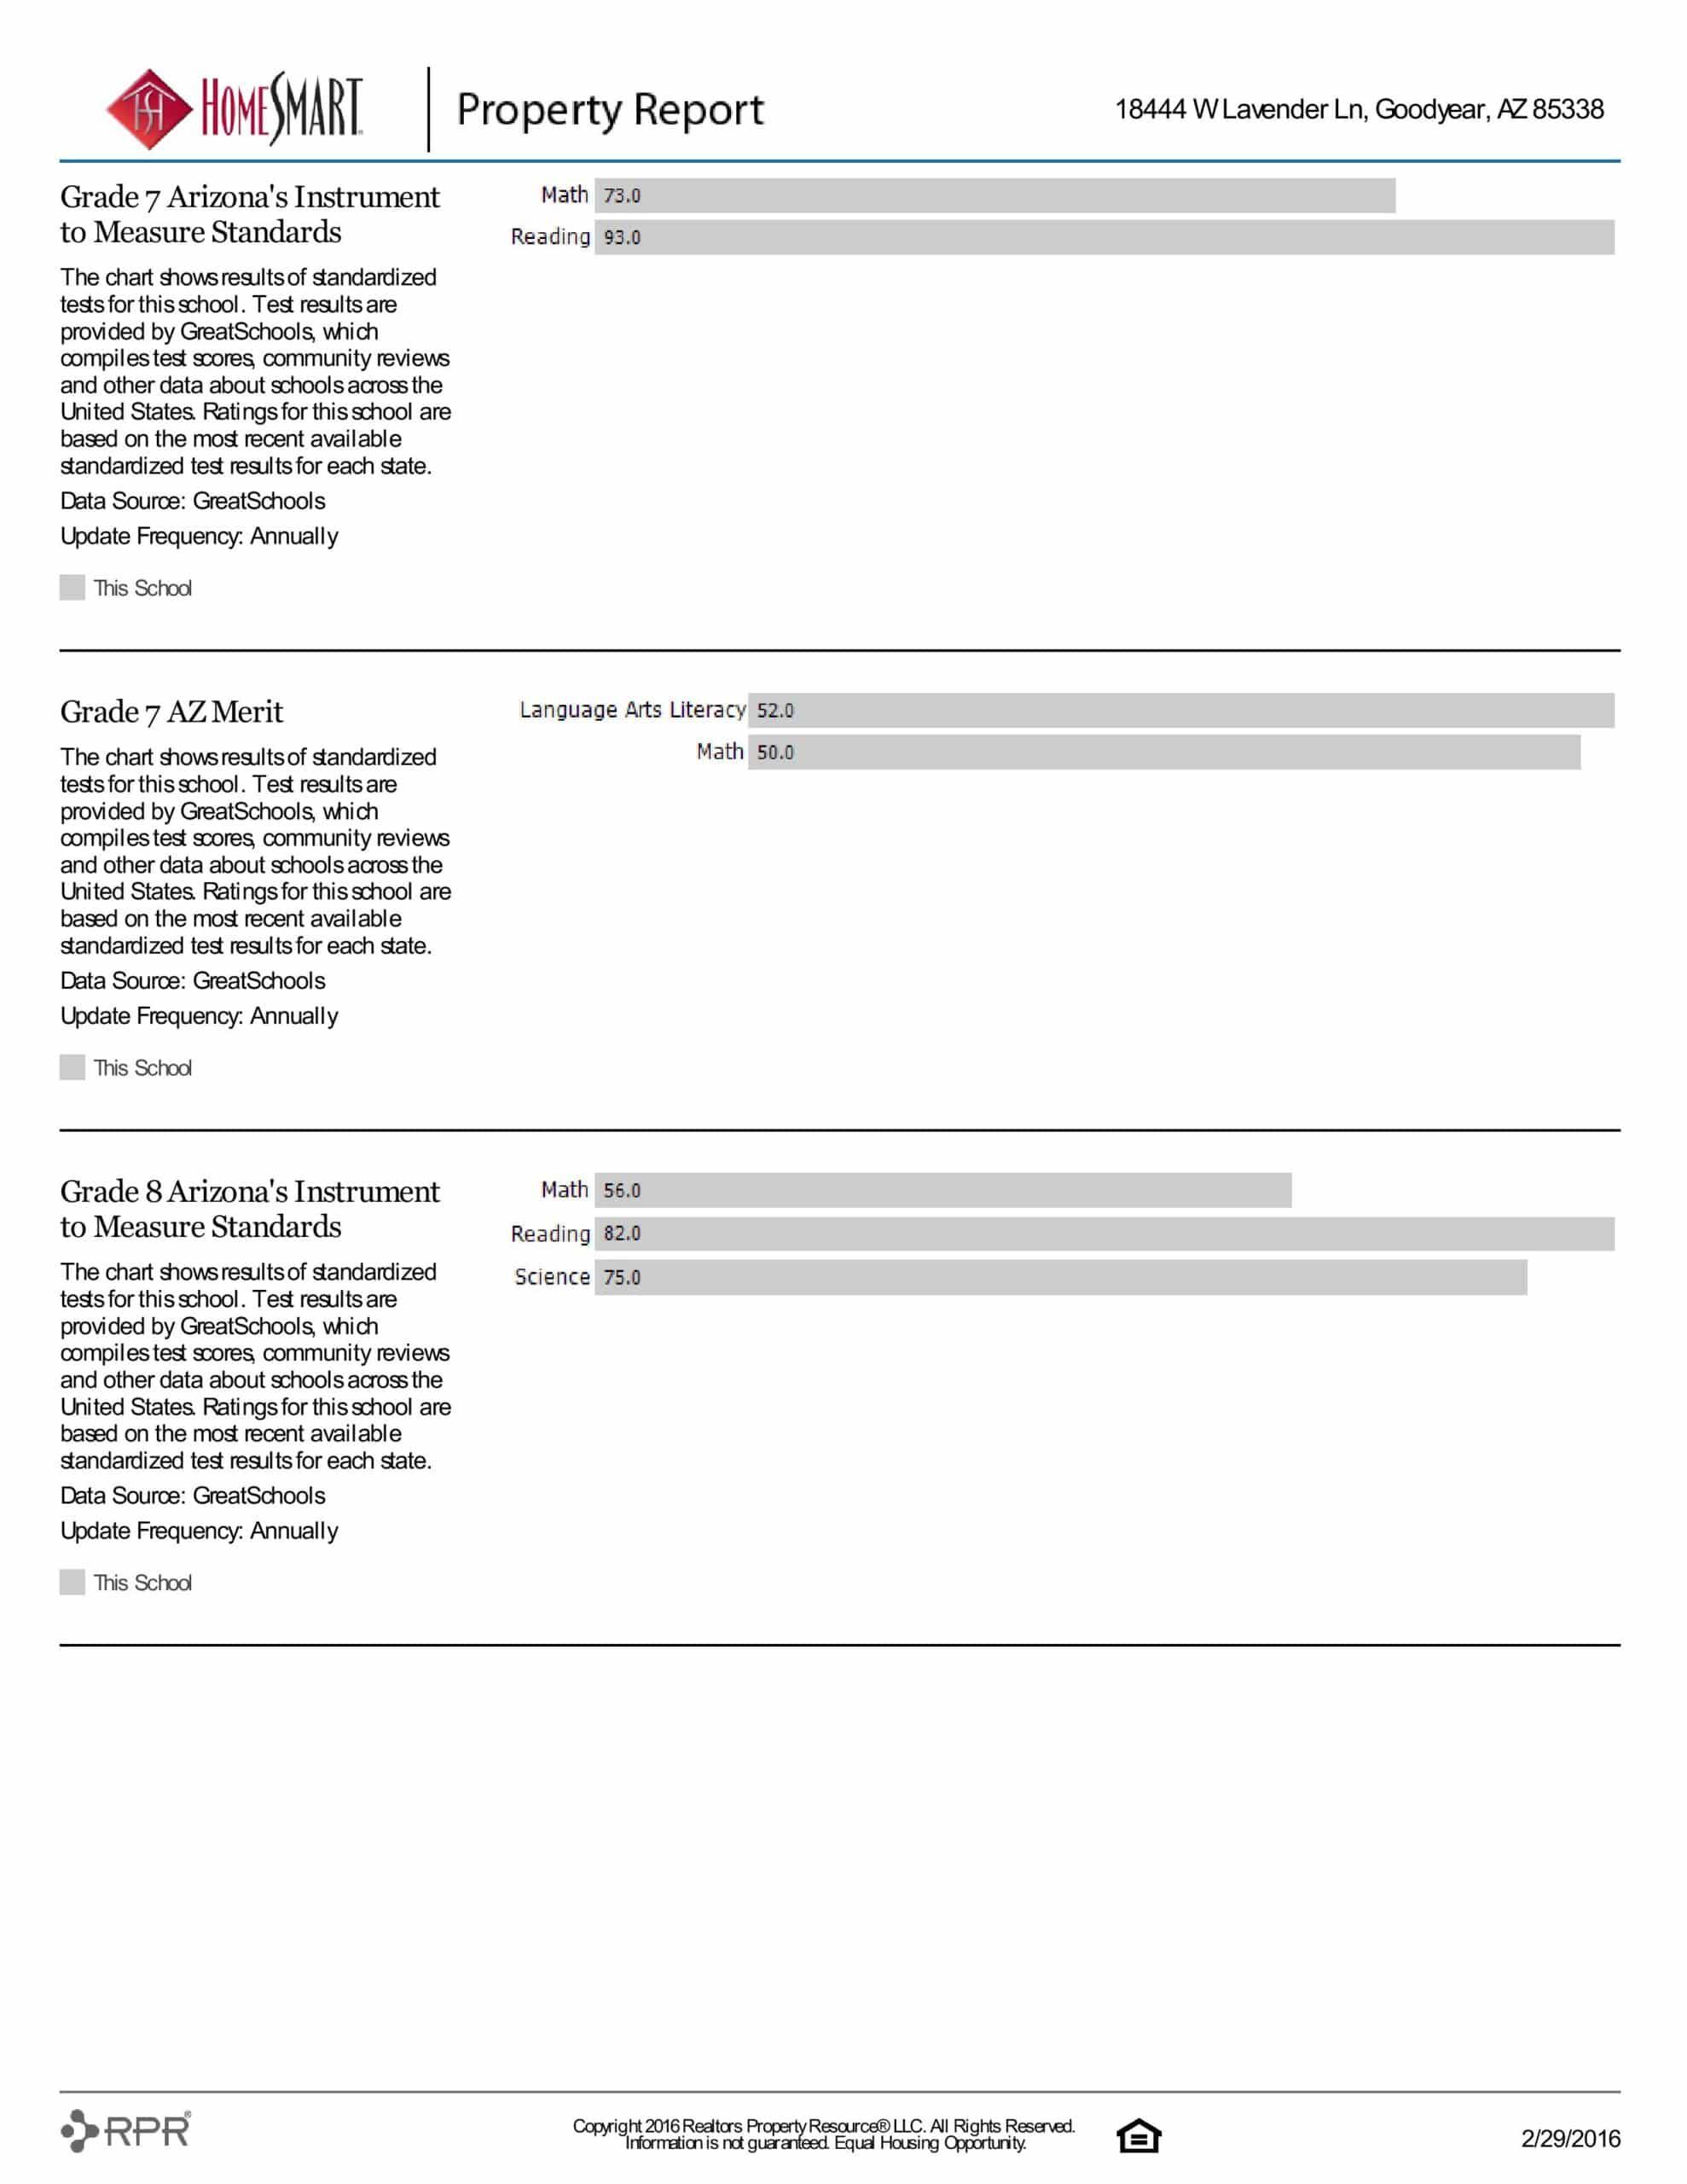 18444 W LAVENDER LN PROPERTY REPORT-page-042